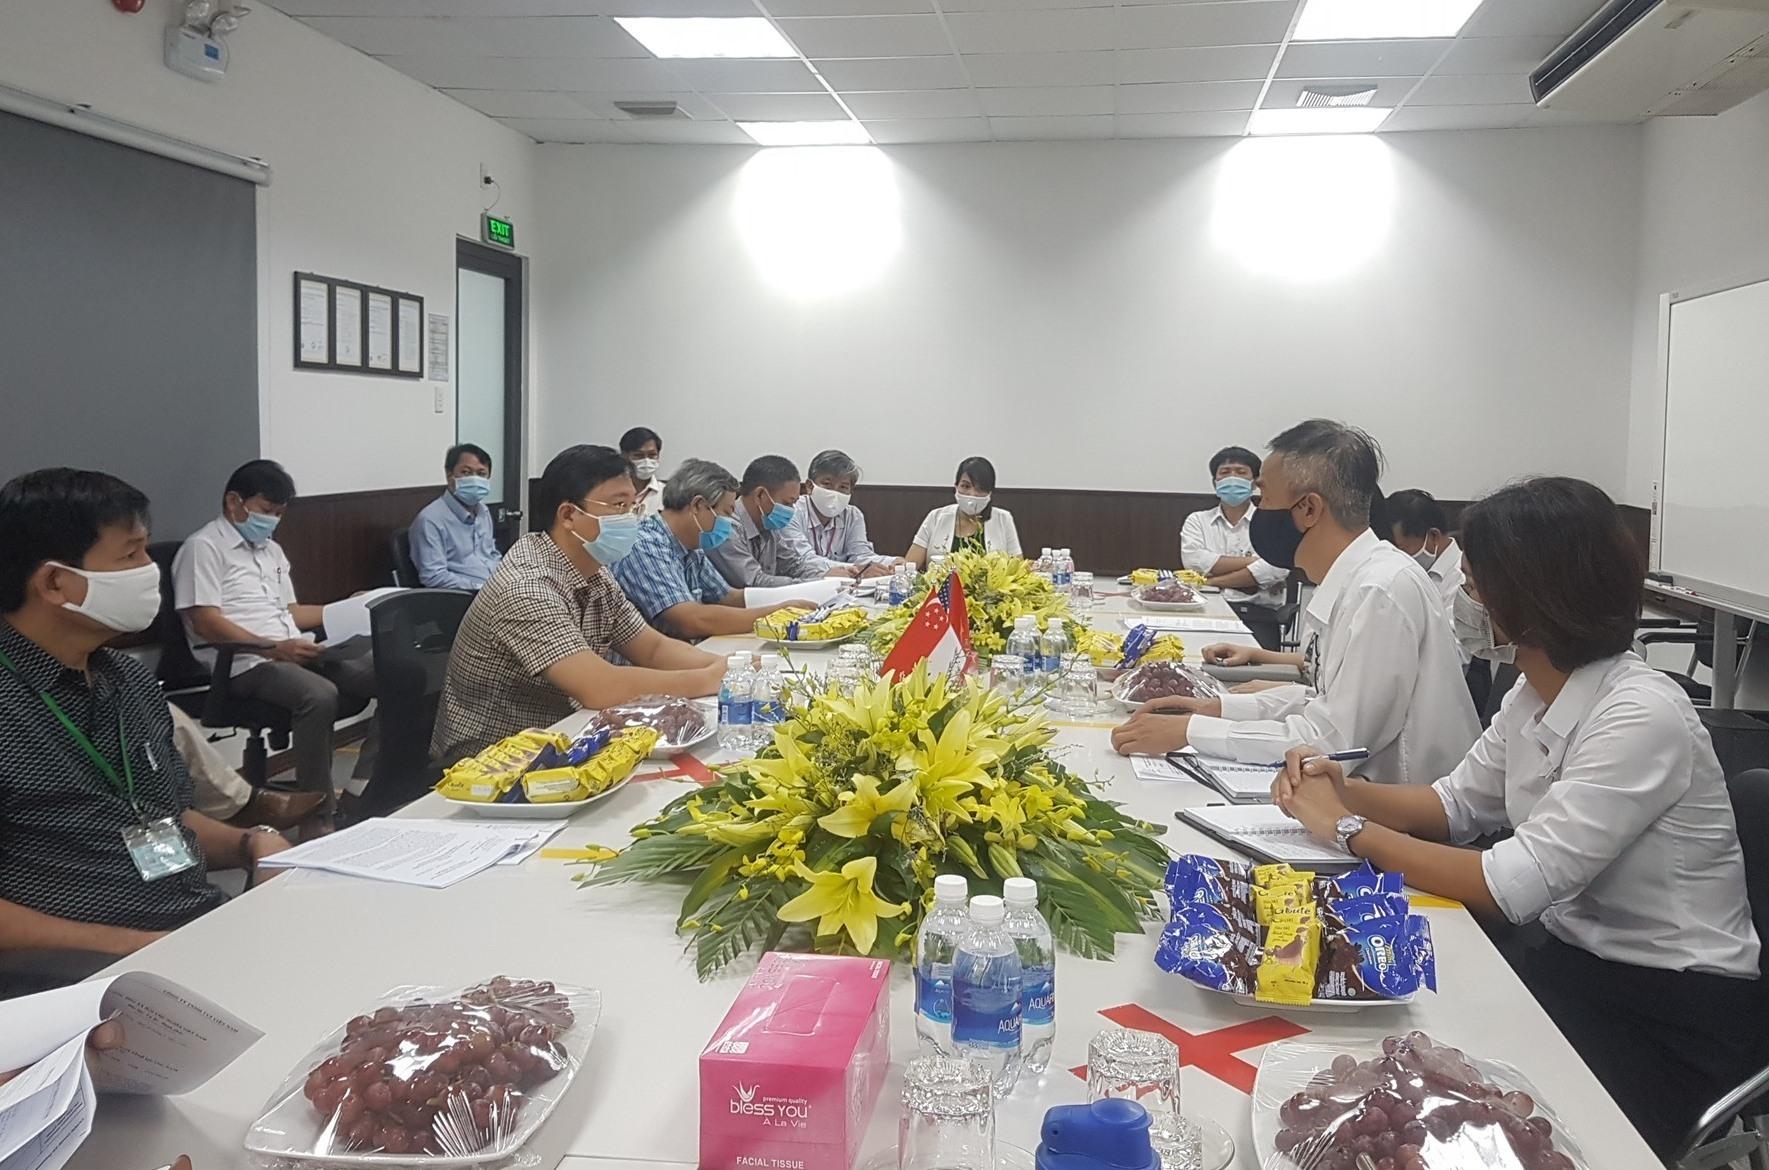 A meeting between Quang Nam leaders and representatives of CCI Viet Nam